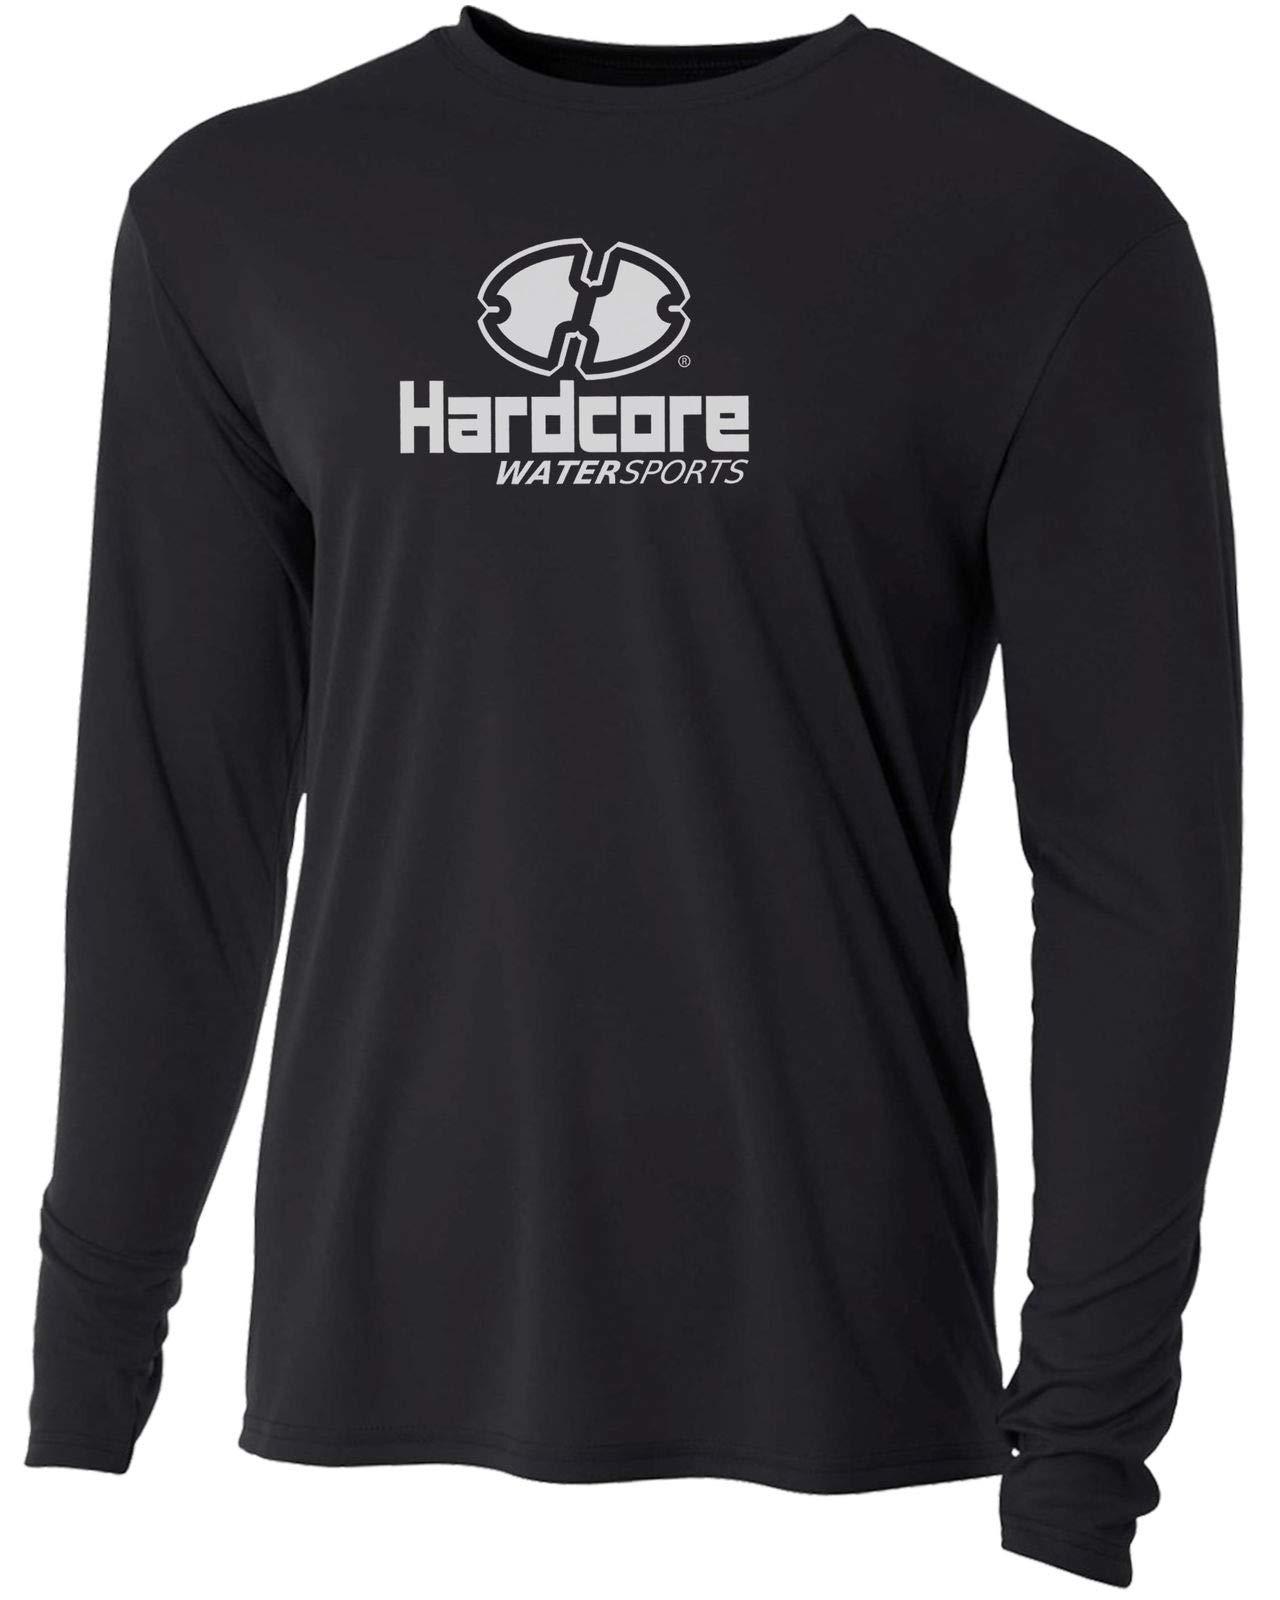 Men's Long Sleeve Loose Fit Rash Guard Surf Shirt Water Sports Swimwear Black by Hardcore Water Sports